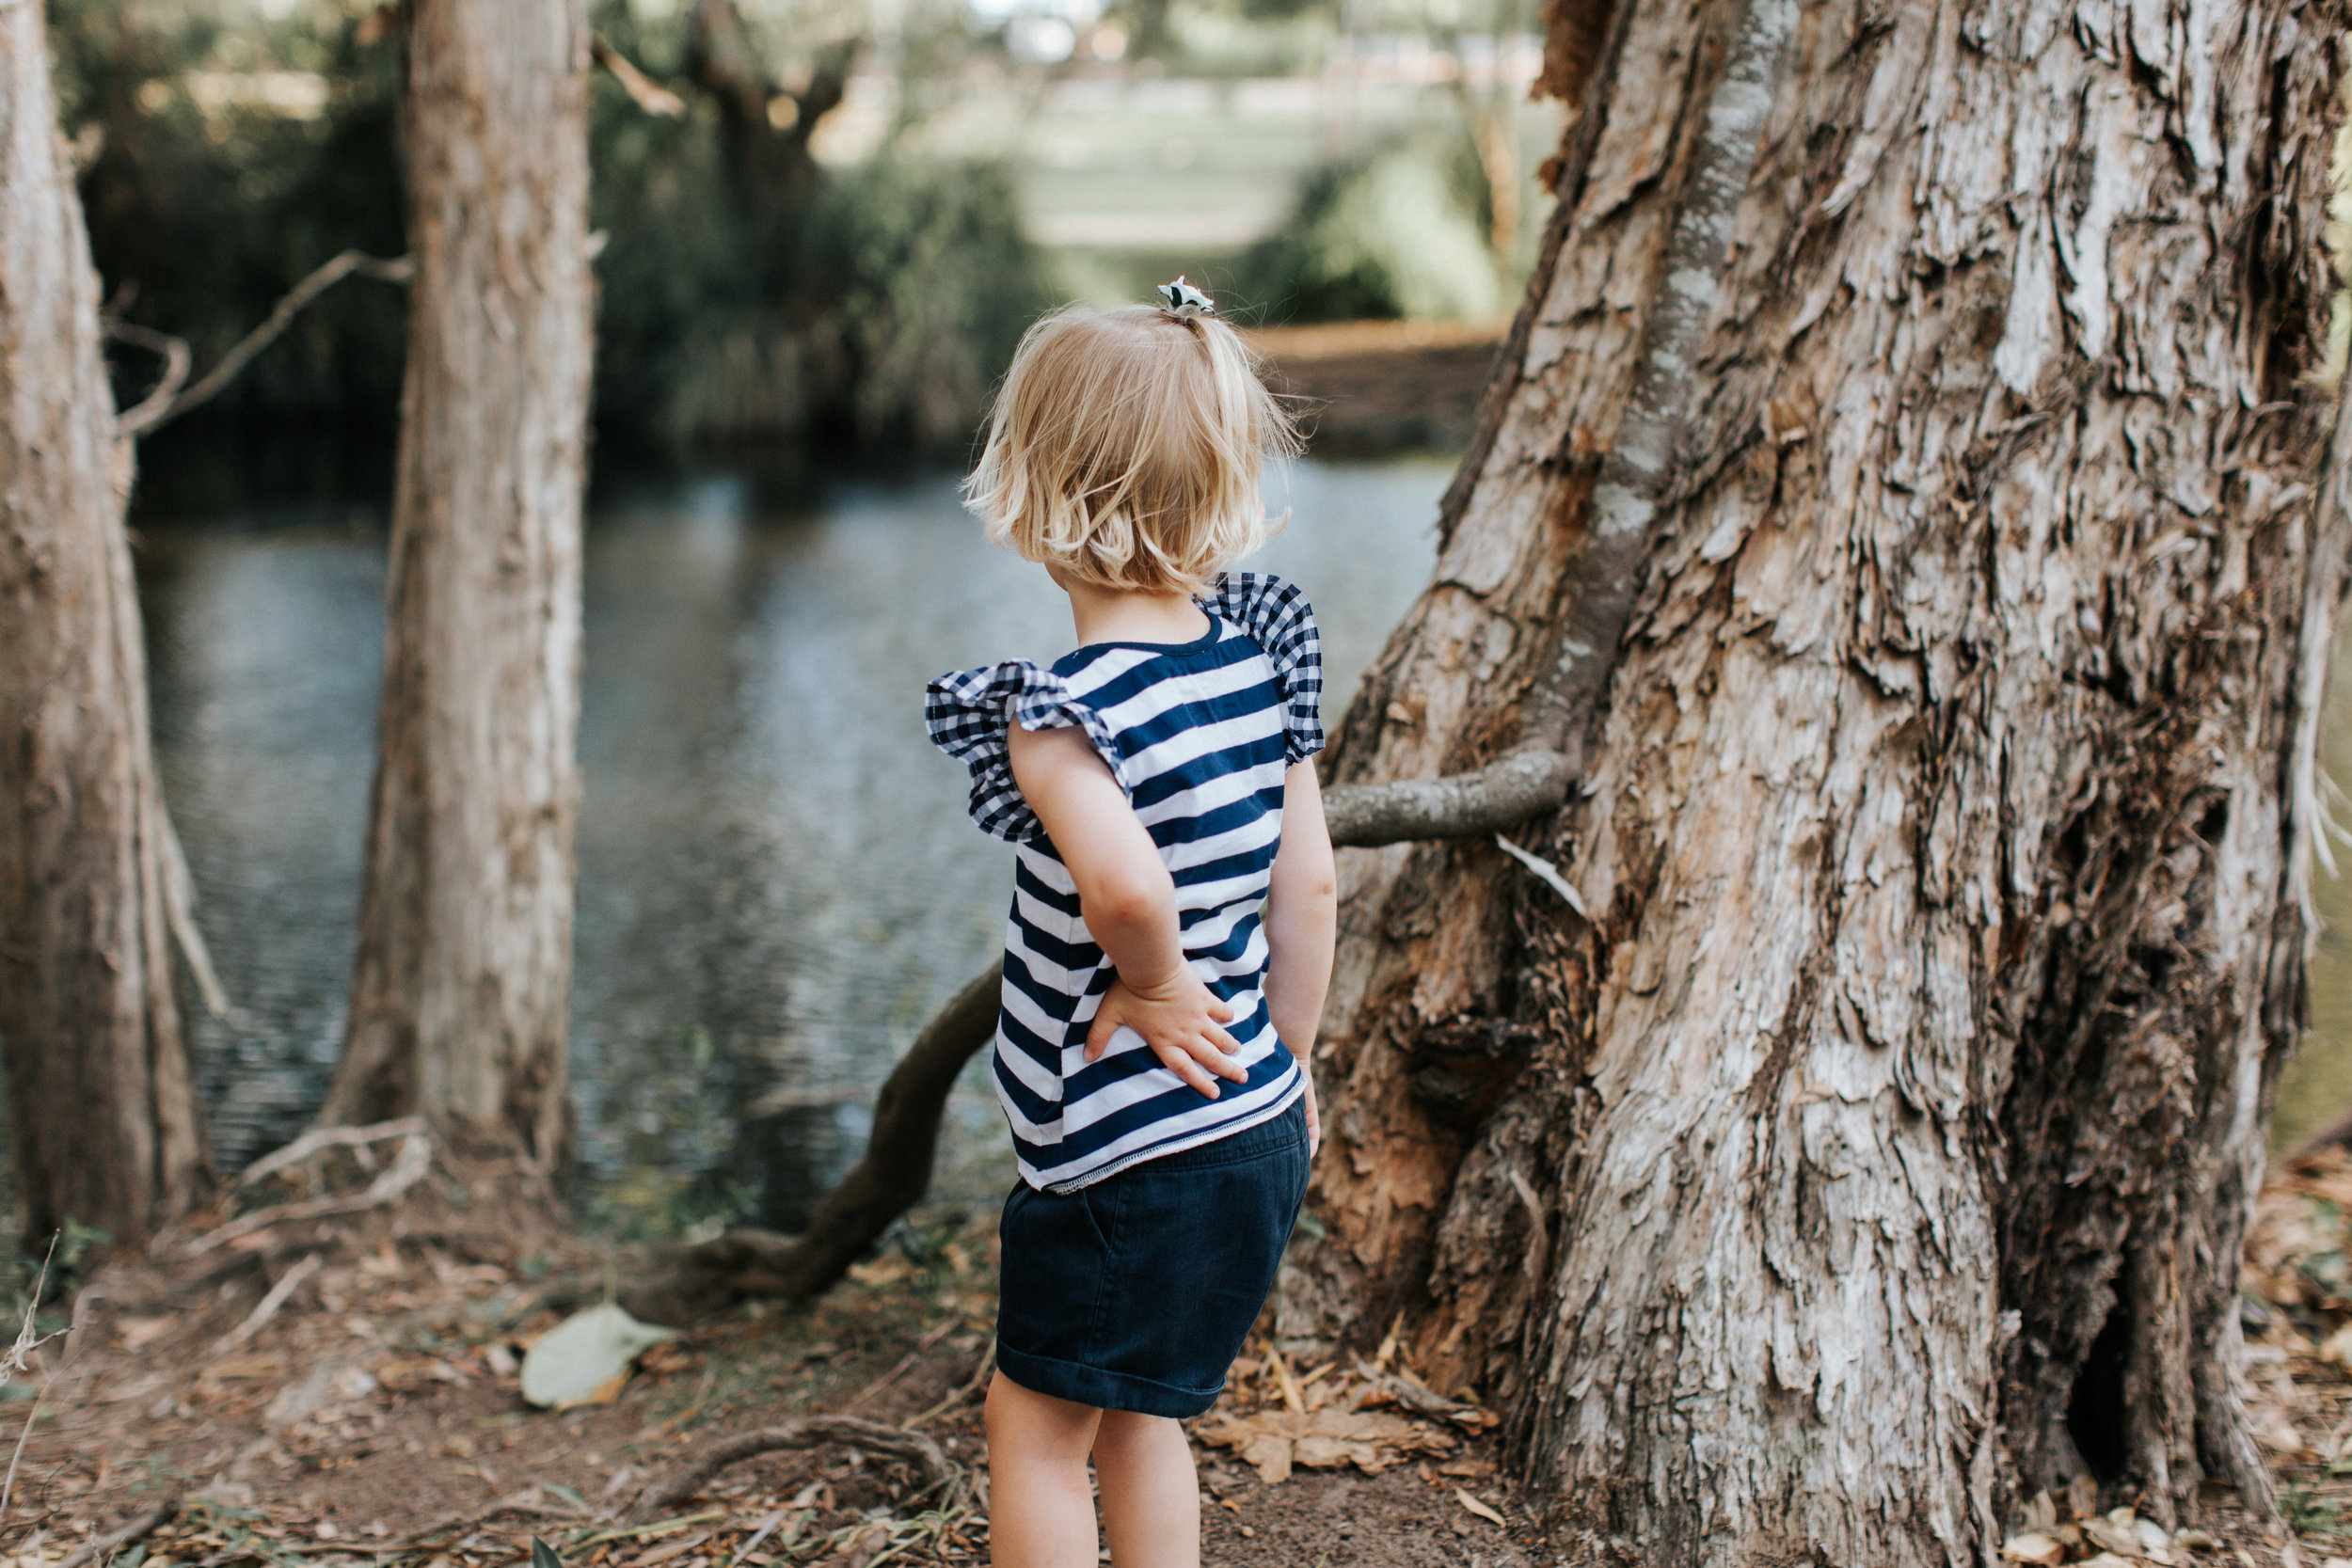 Brisbane family photographer kym renay.cullen.fam 016.jpg